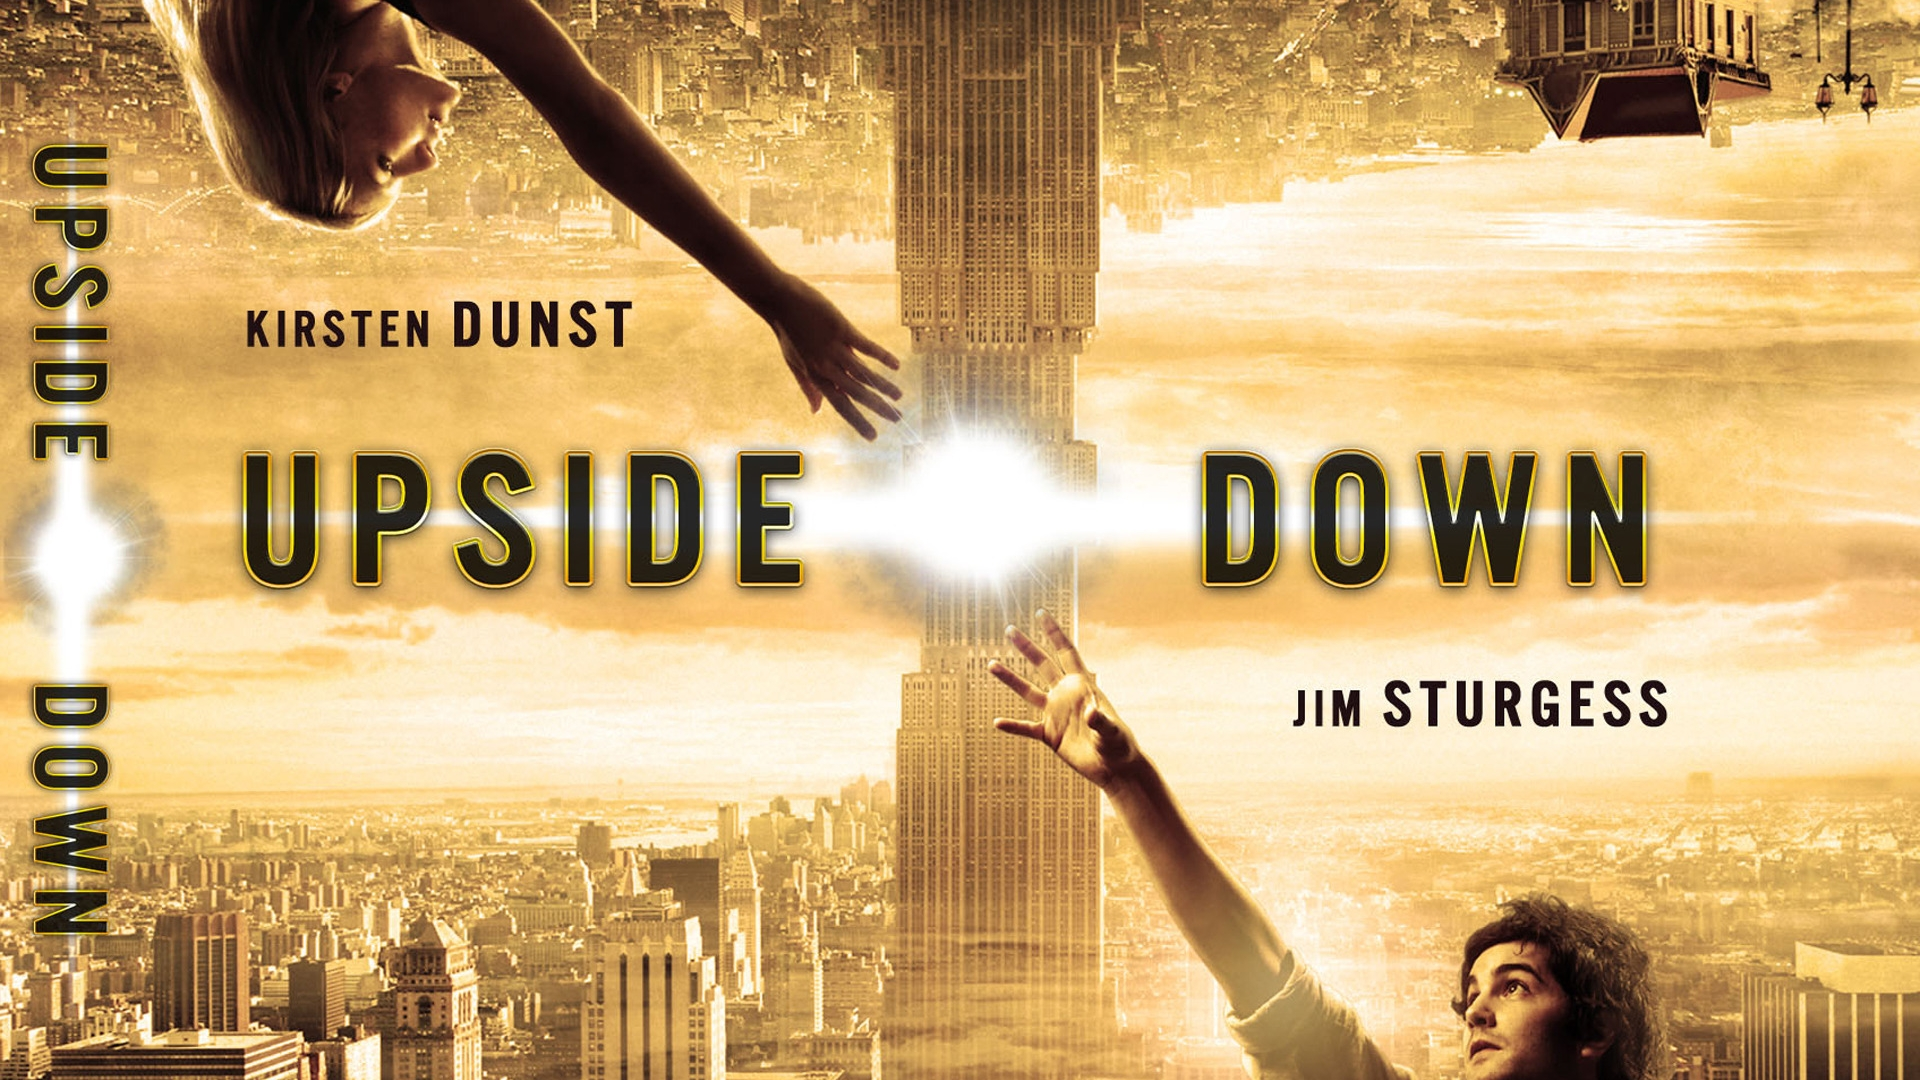 upside down full movie free download hd